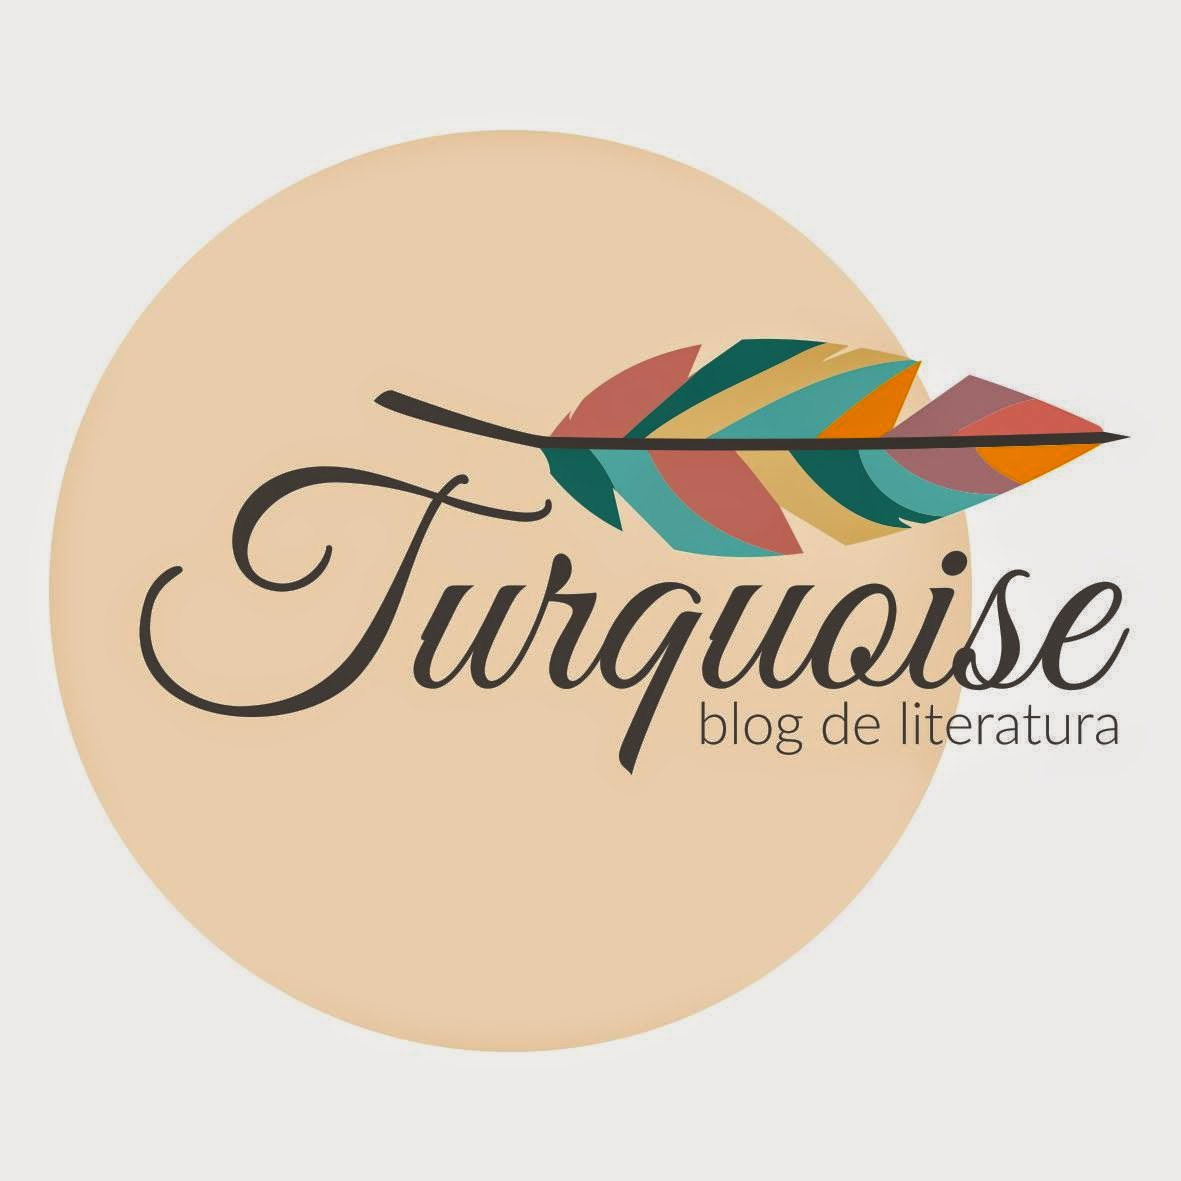 https://turquoiseliteratura.wordpress.com/